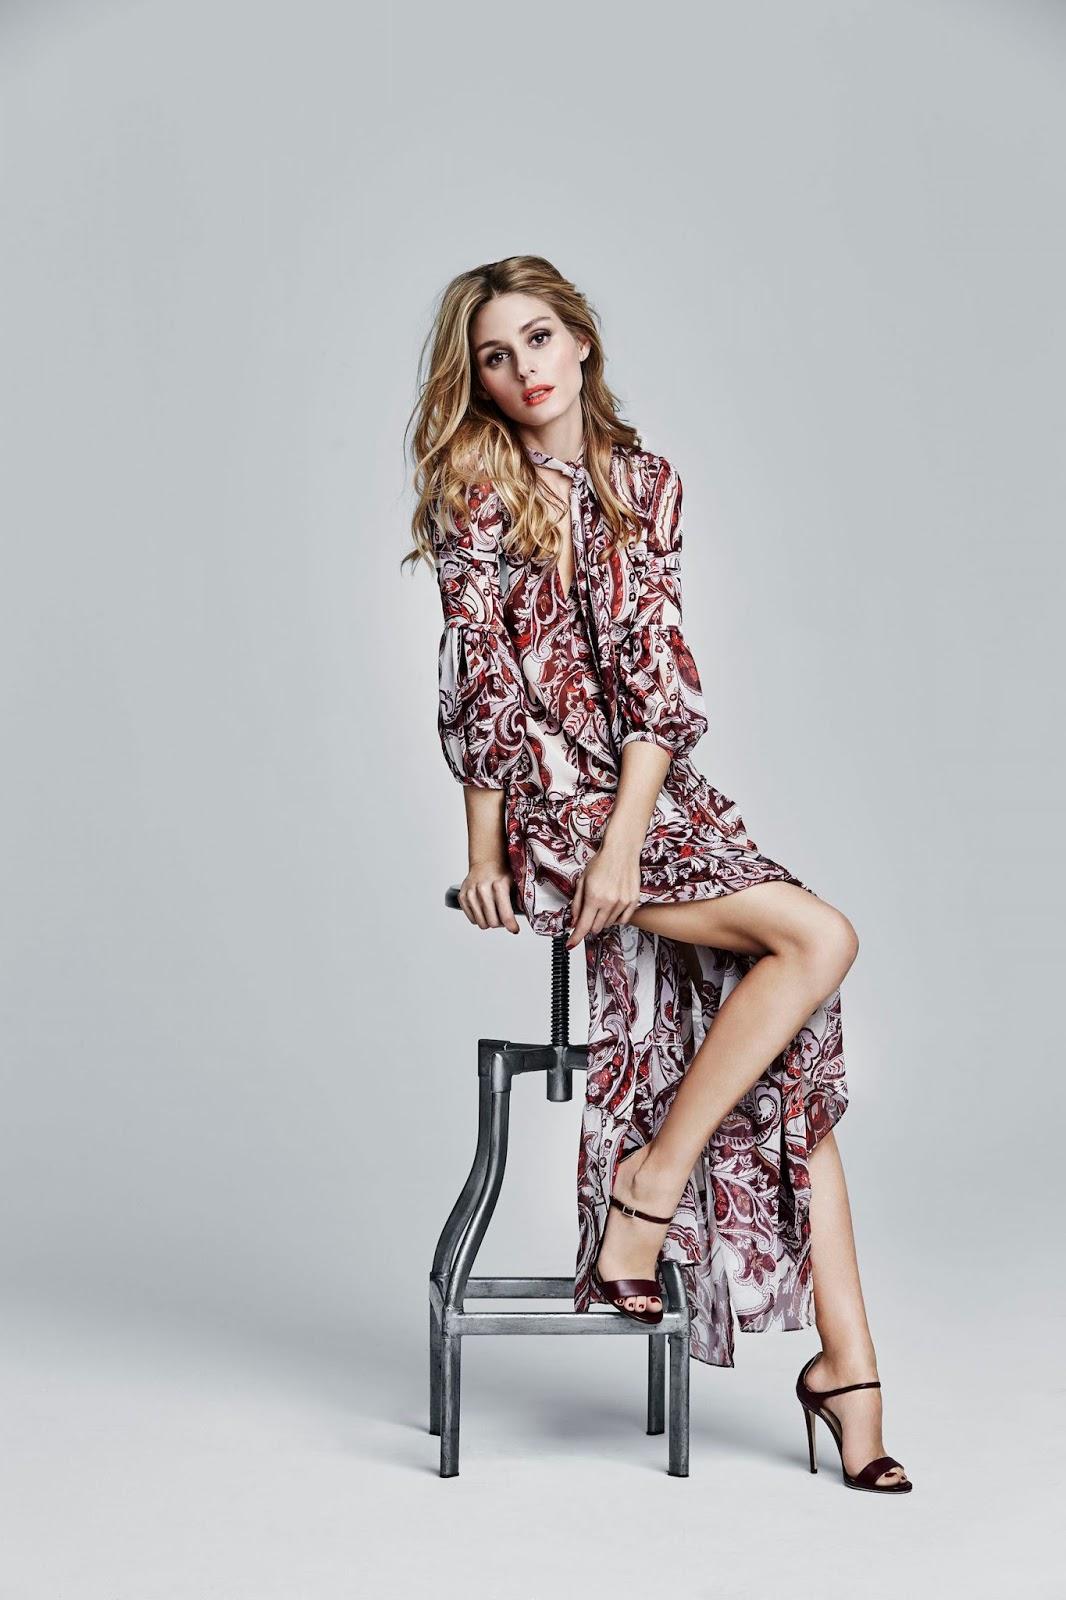 Olivia Palermo In Fashion Magazine March 2016 By Gabor Jurina